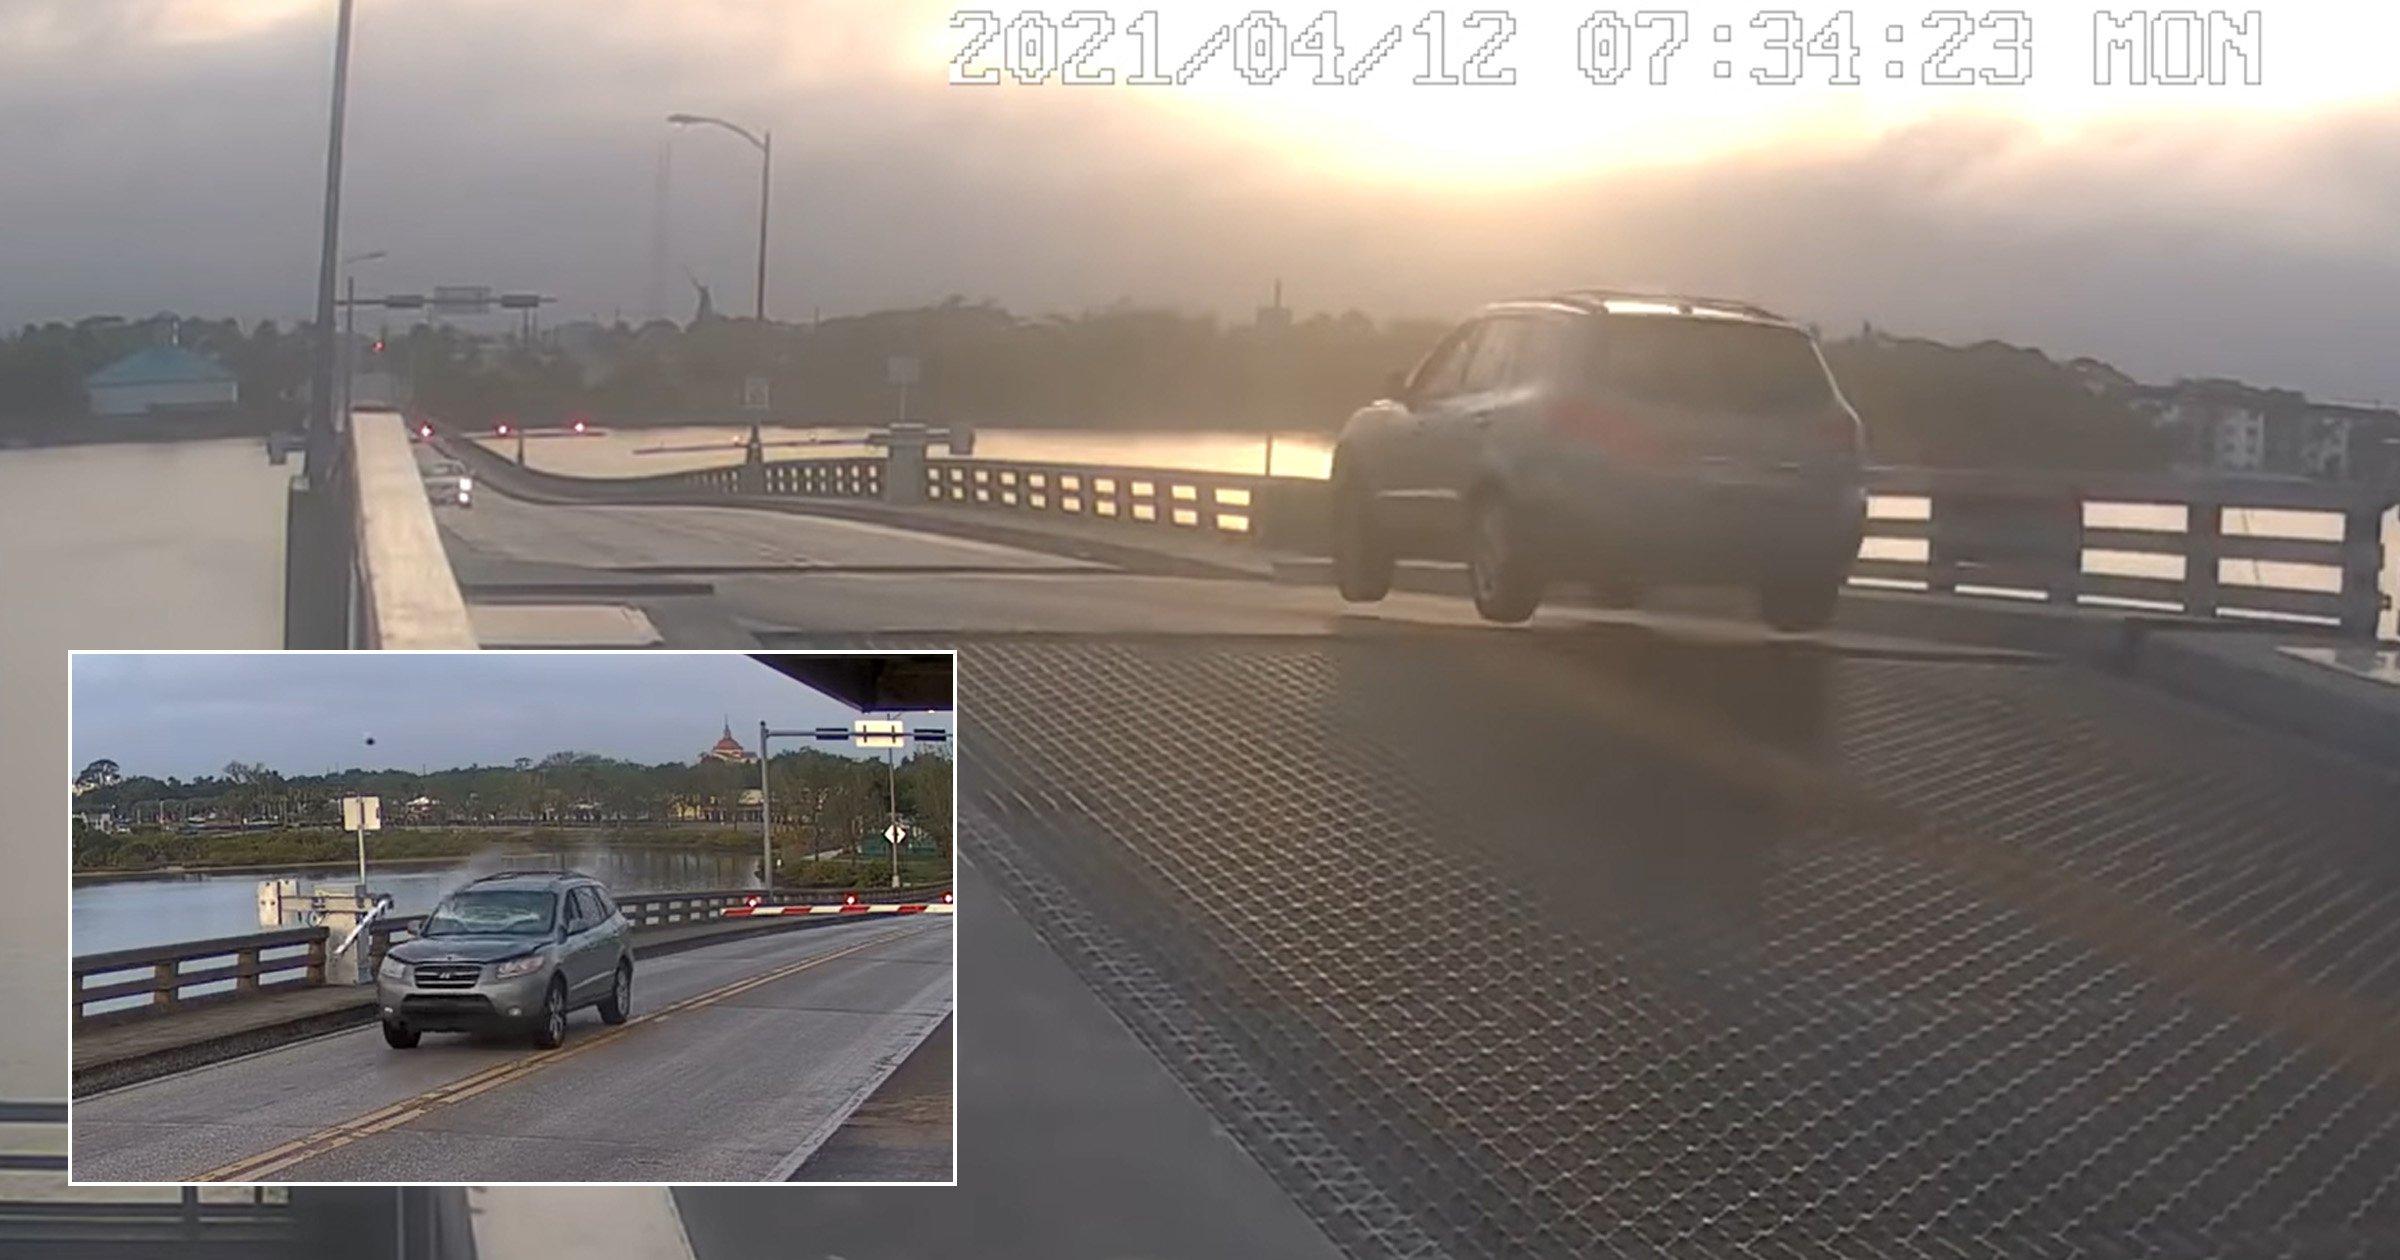 Moment daredevil driver leaps over drawbridge as it opens